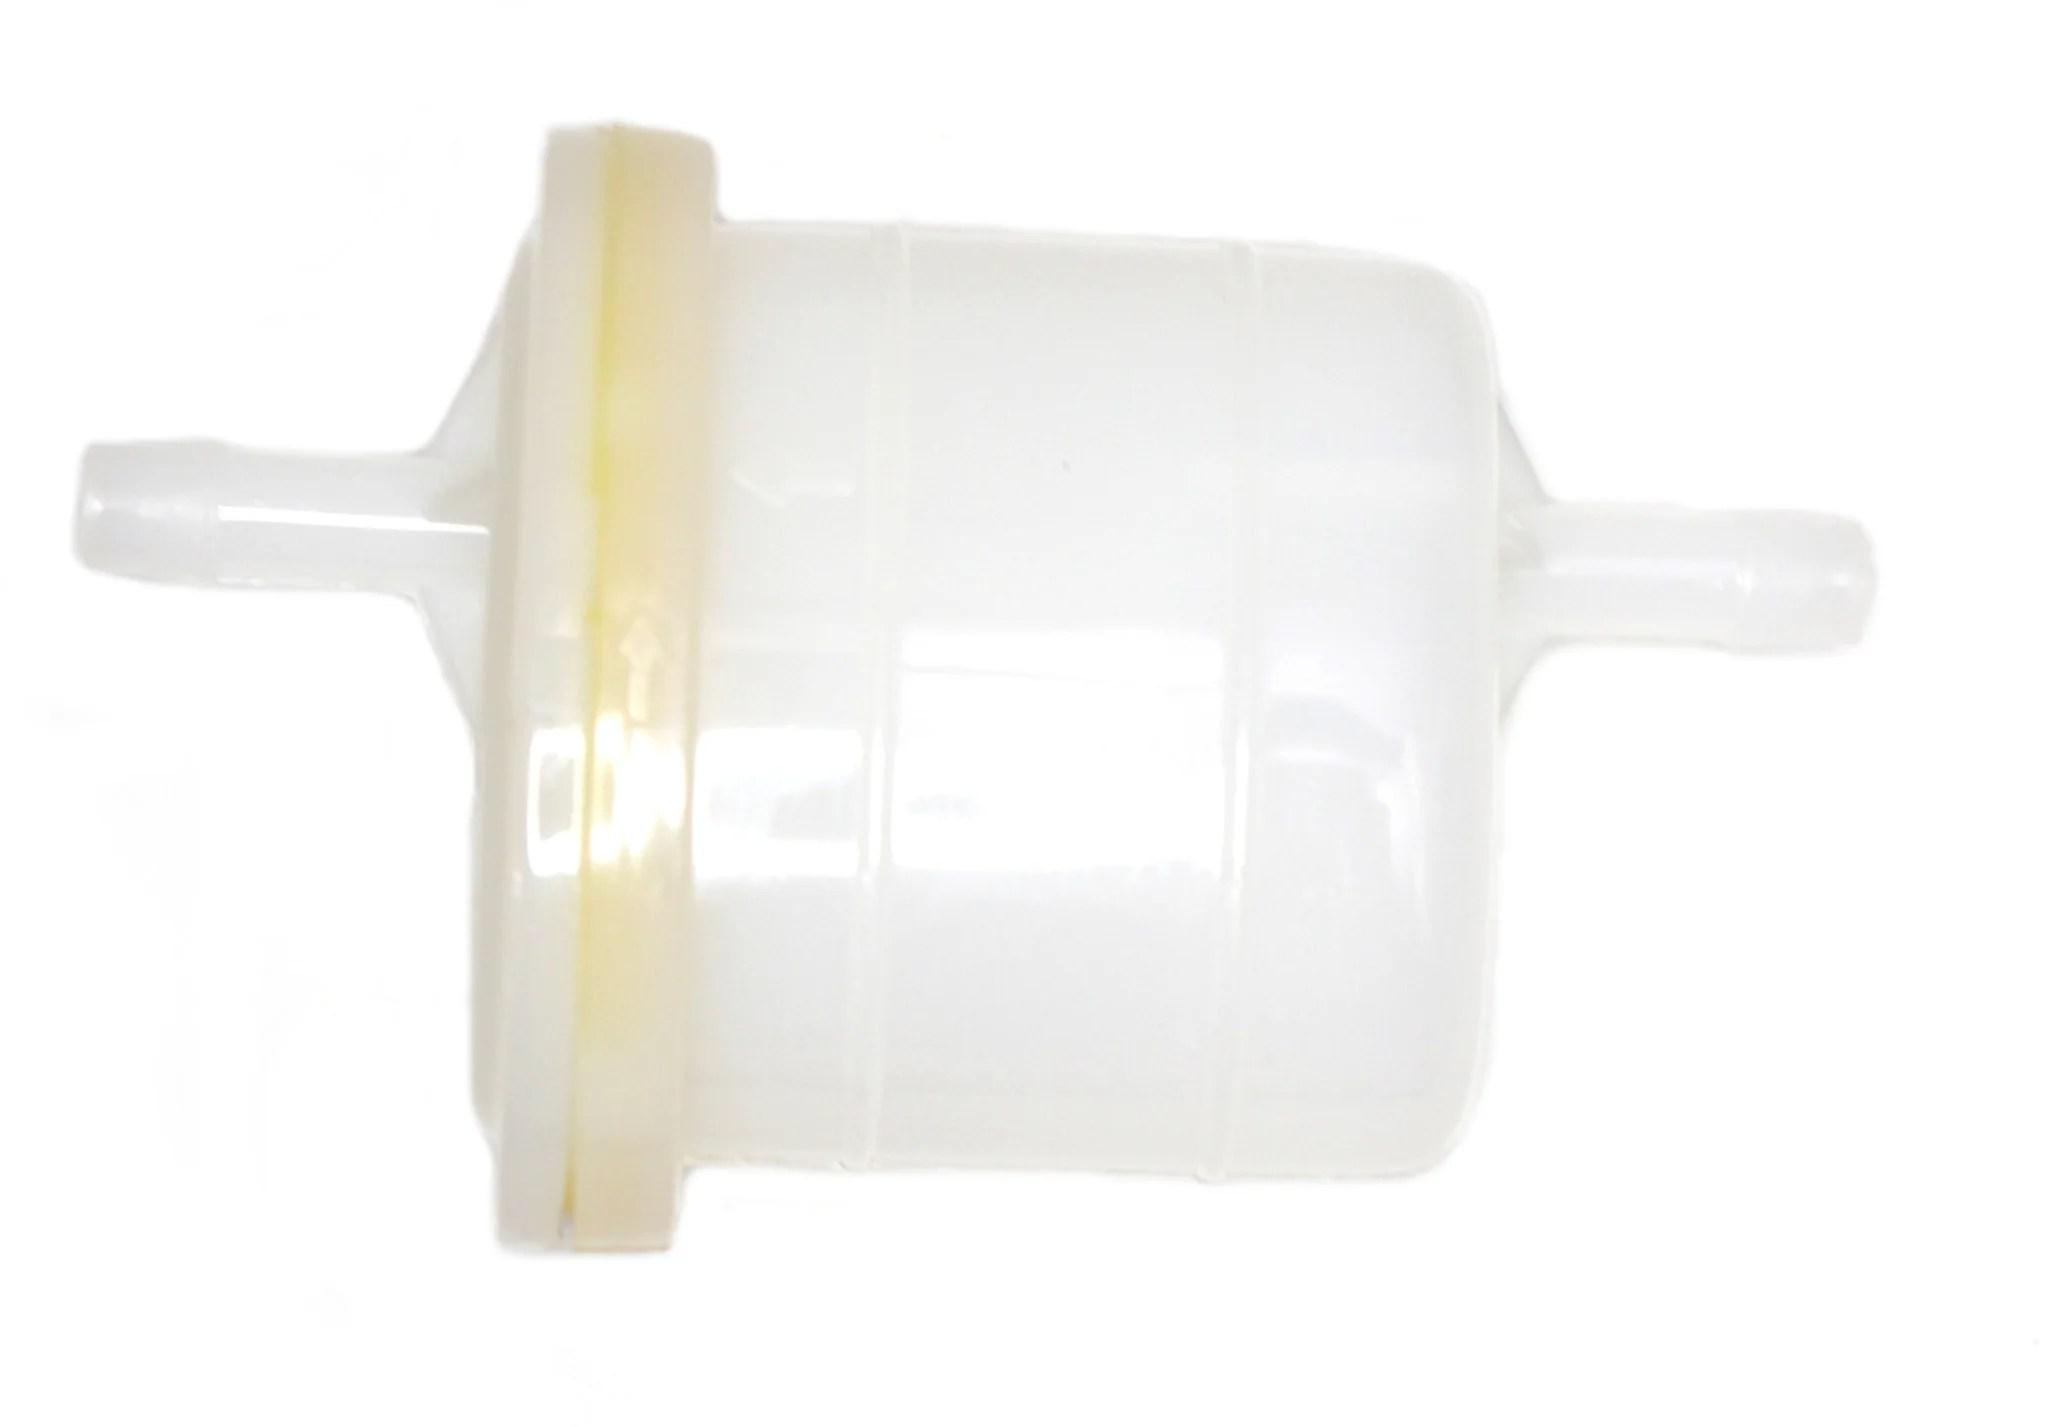 small resolution of  yamaha pwc waverunner gas fuel filter 6k8 24560 10 00 6k8 24560